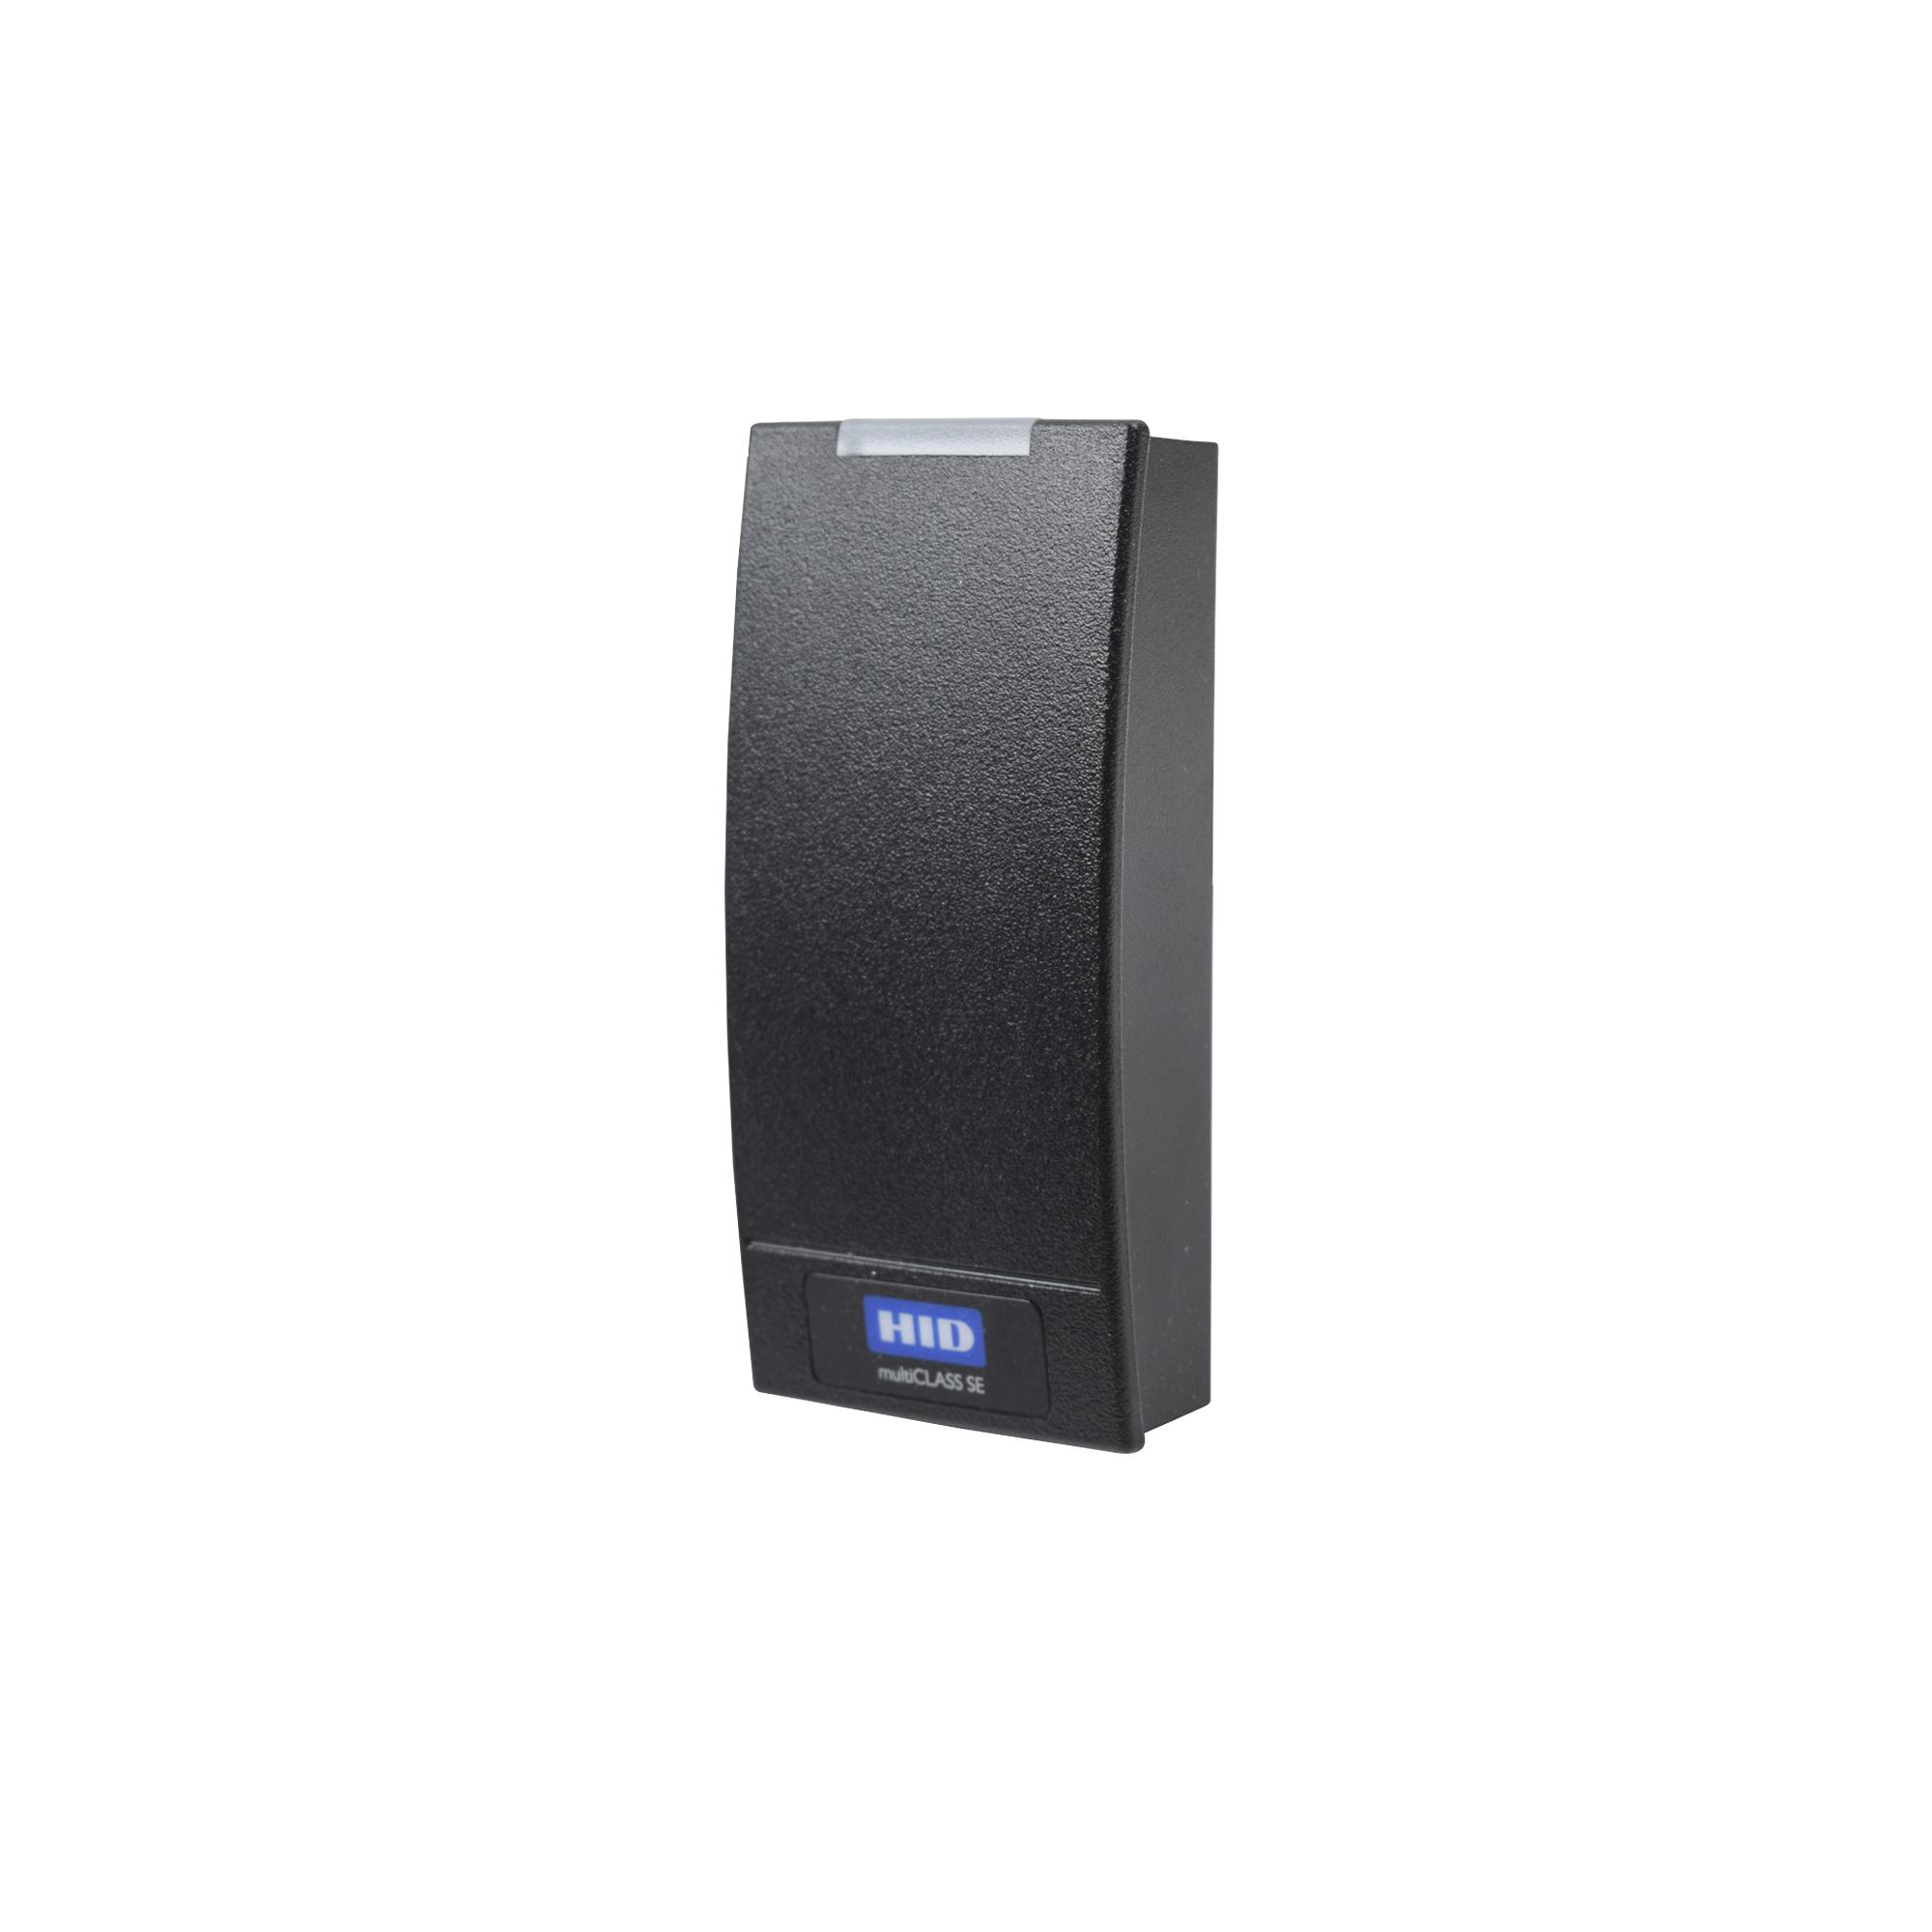 Lector Multiformato HID R10 (900PTNNEK00000)/ SEOS (No Clonable)/iClass SE/ iClass SR/ iClass /Mifare Classic, DesFire, Proximidad, Garantia de por Vida